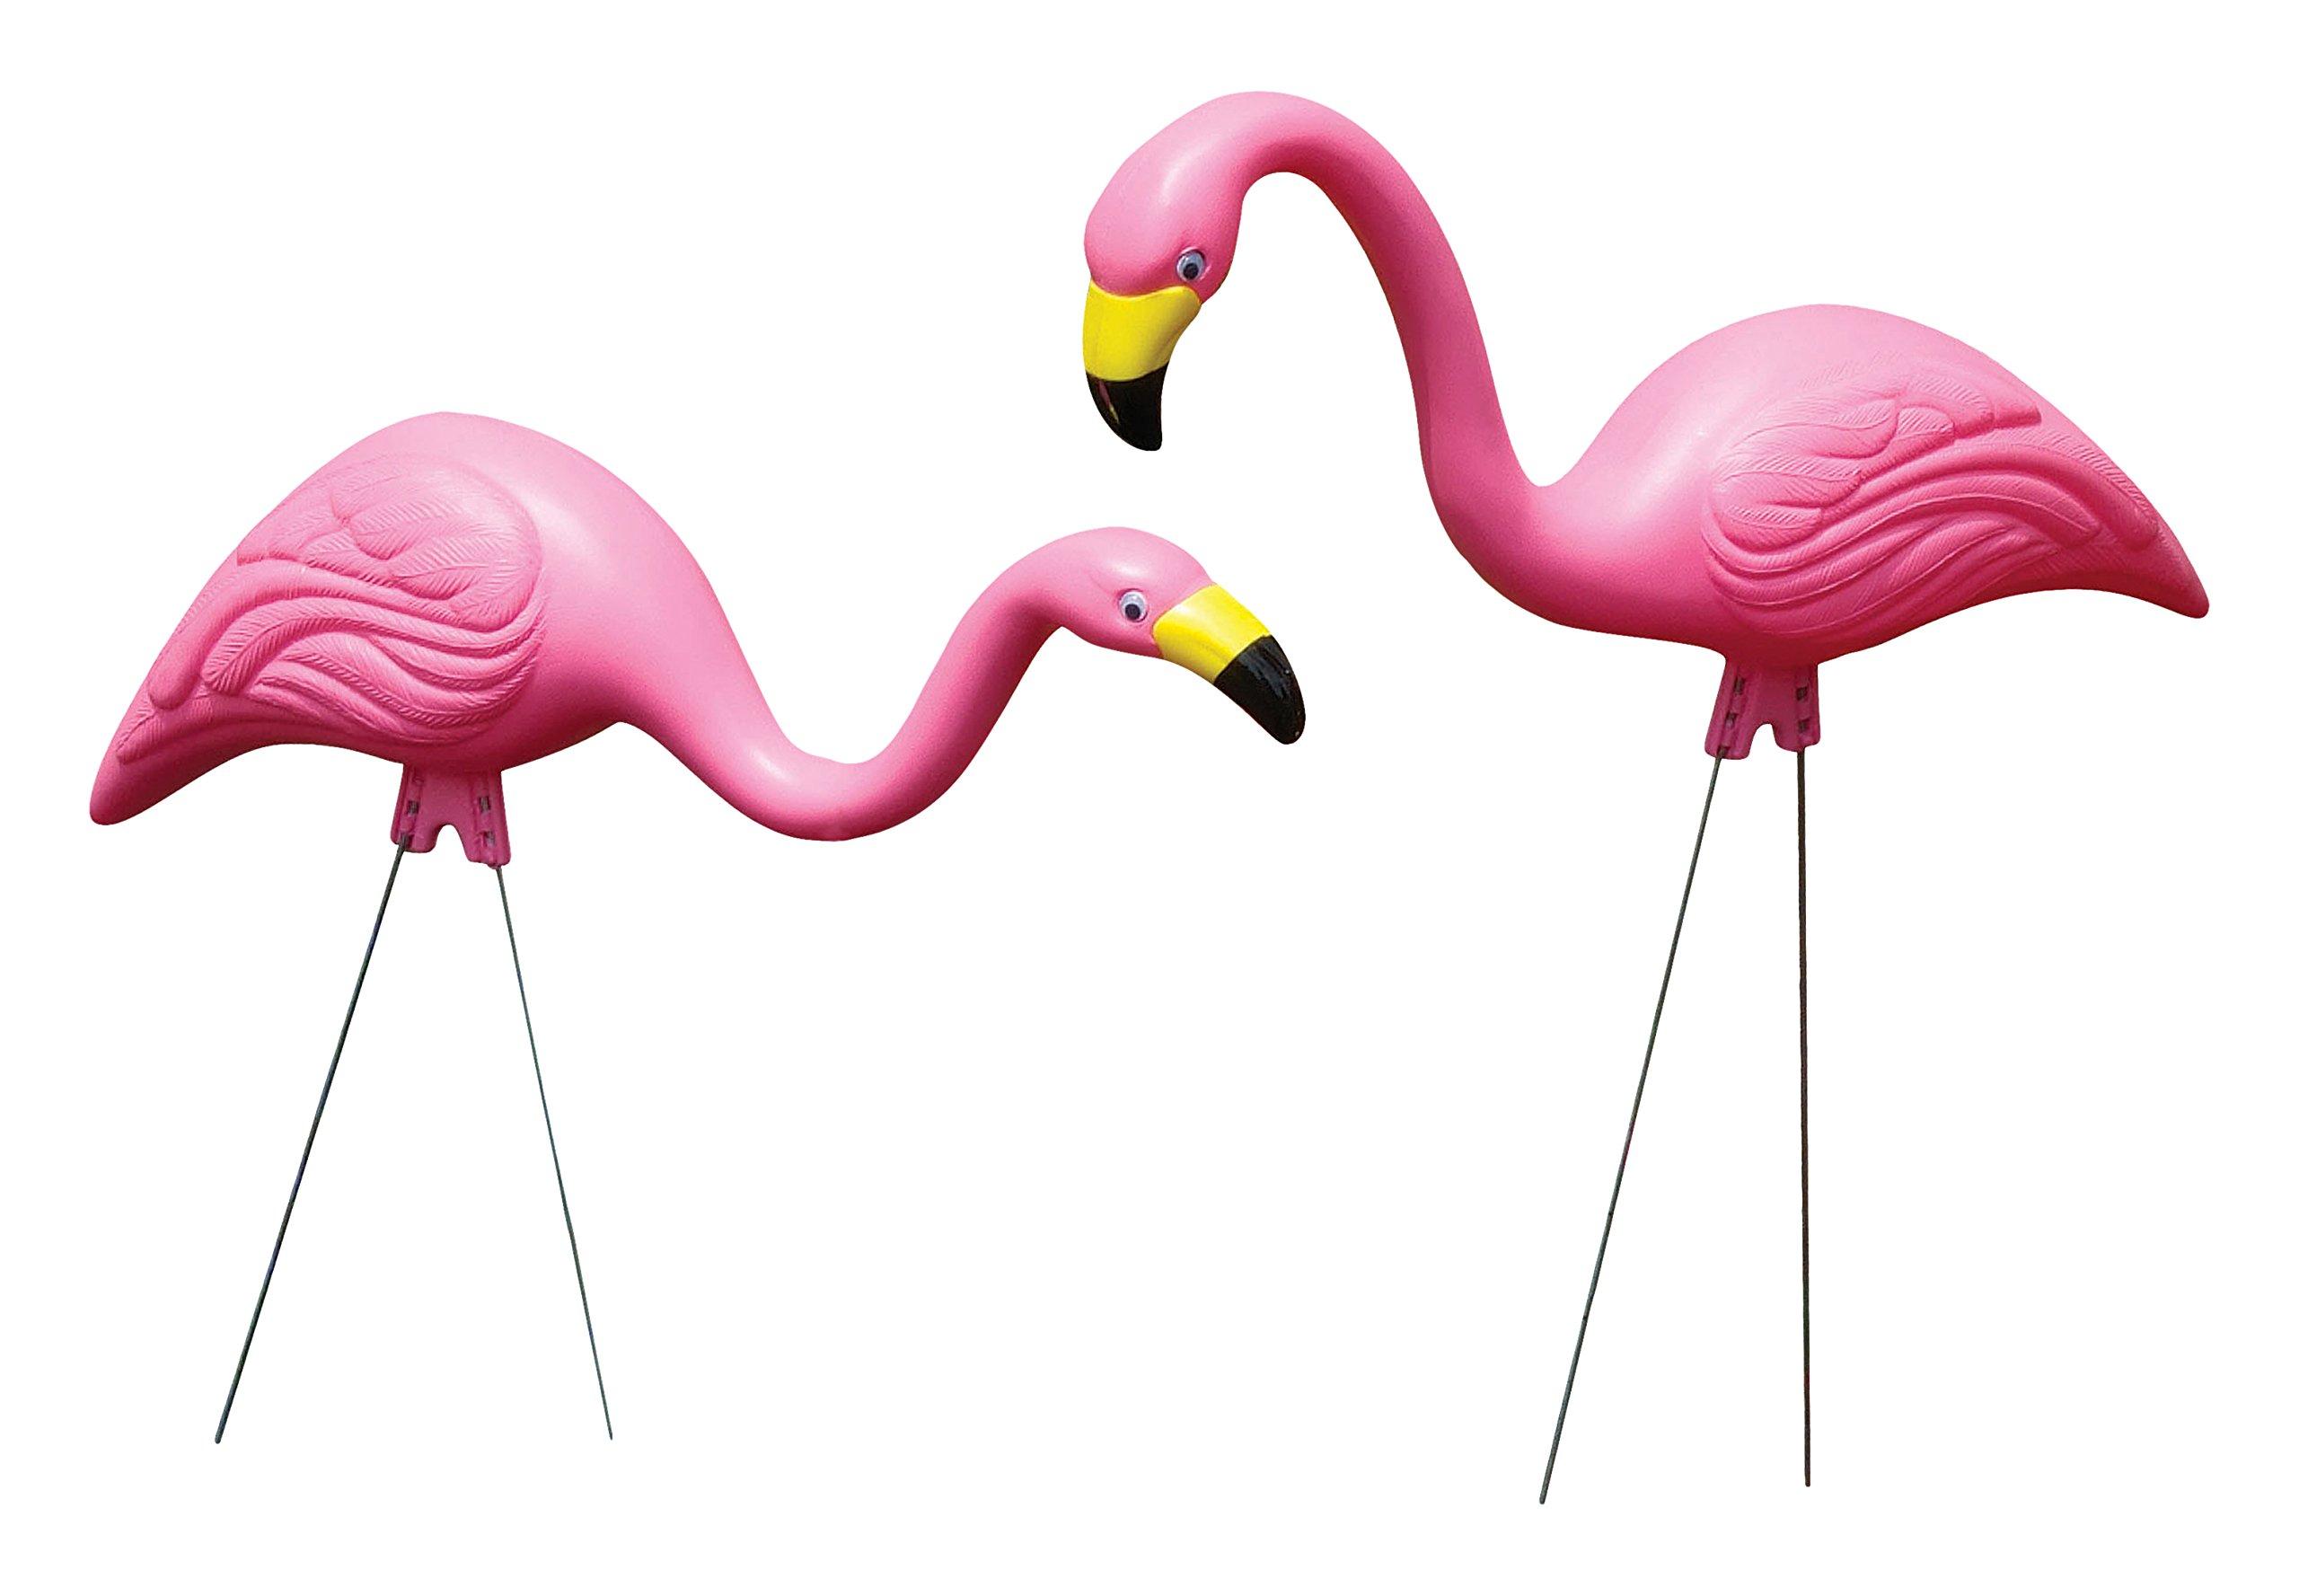 Bloem Pink Flamingo Garden Yard Statue 2-Pack (G2)